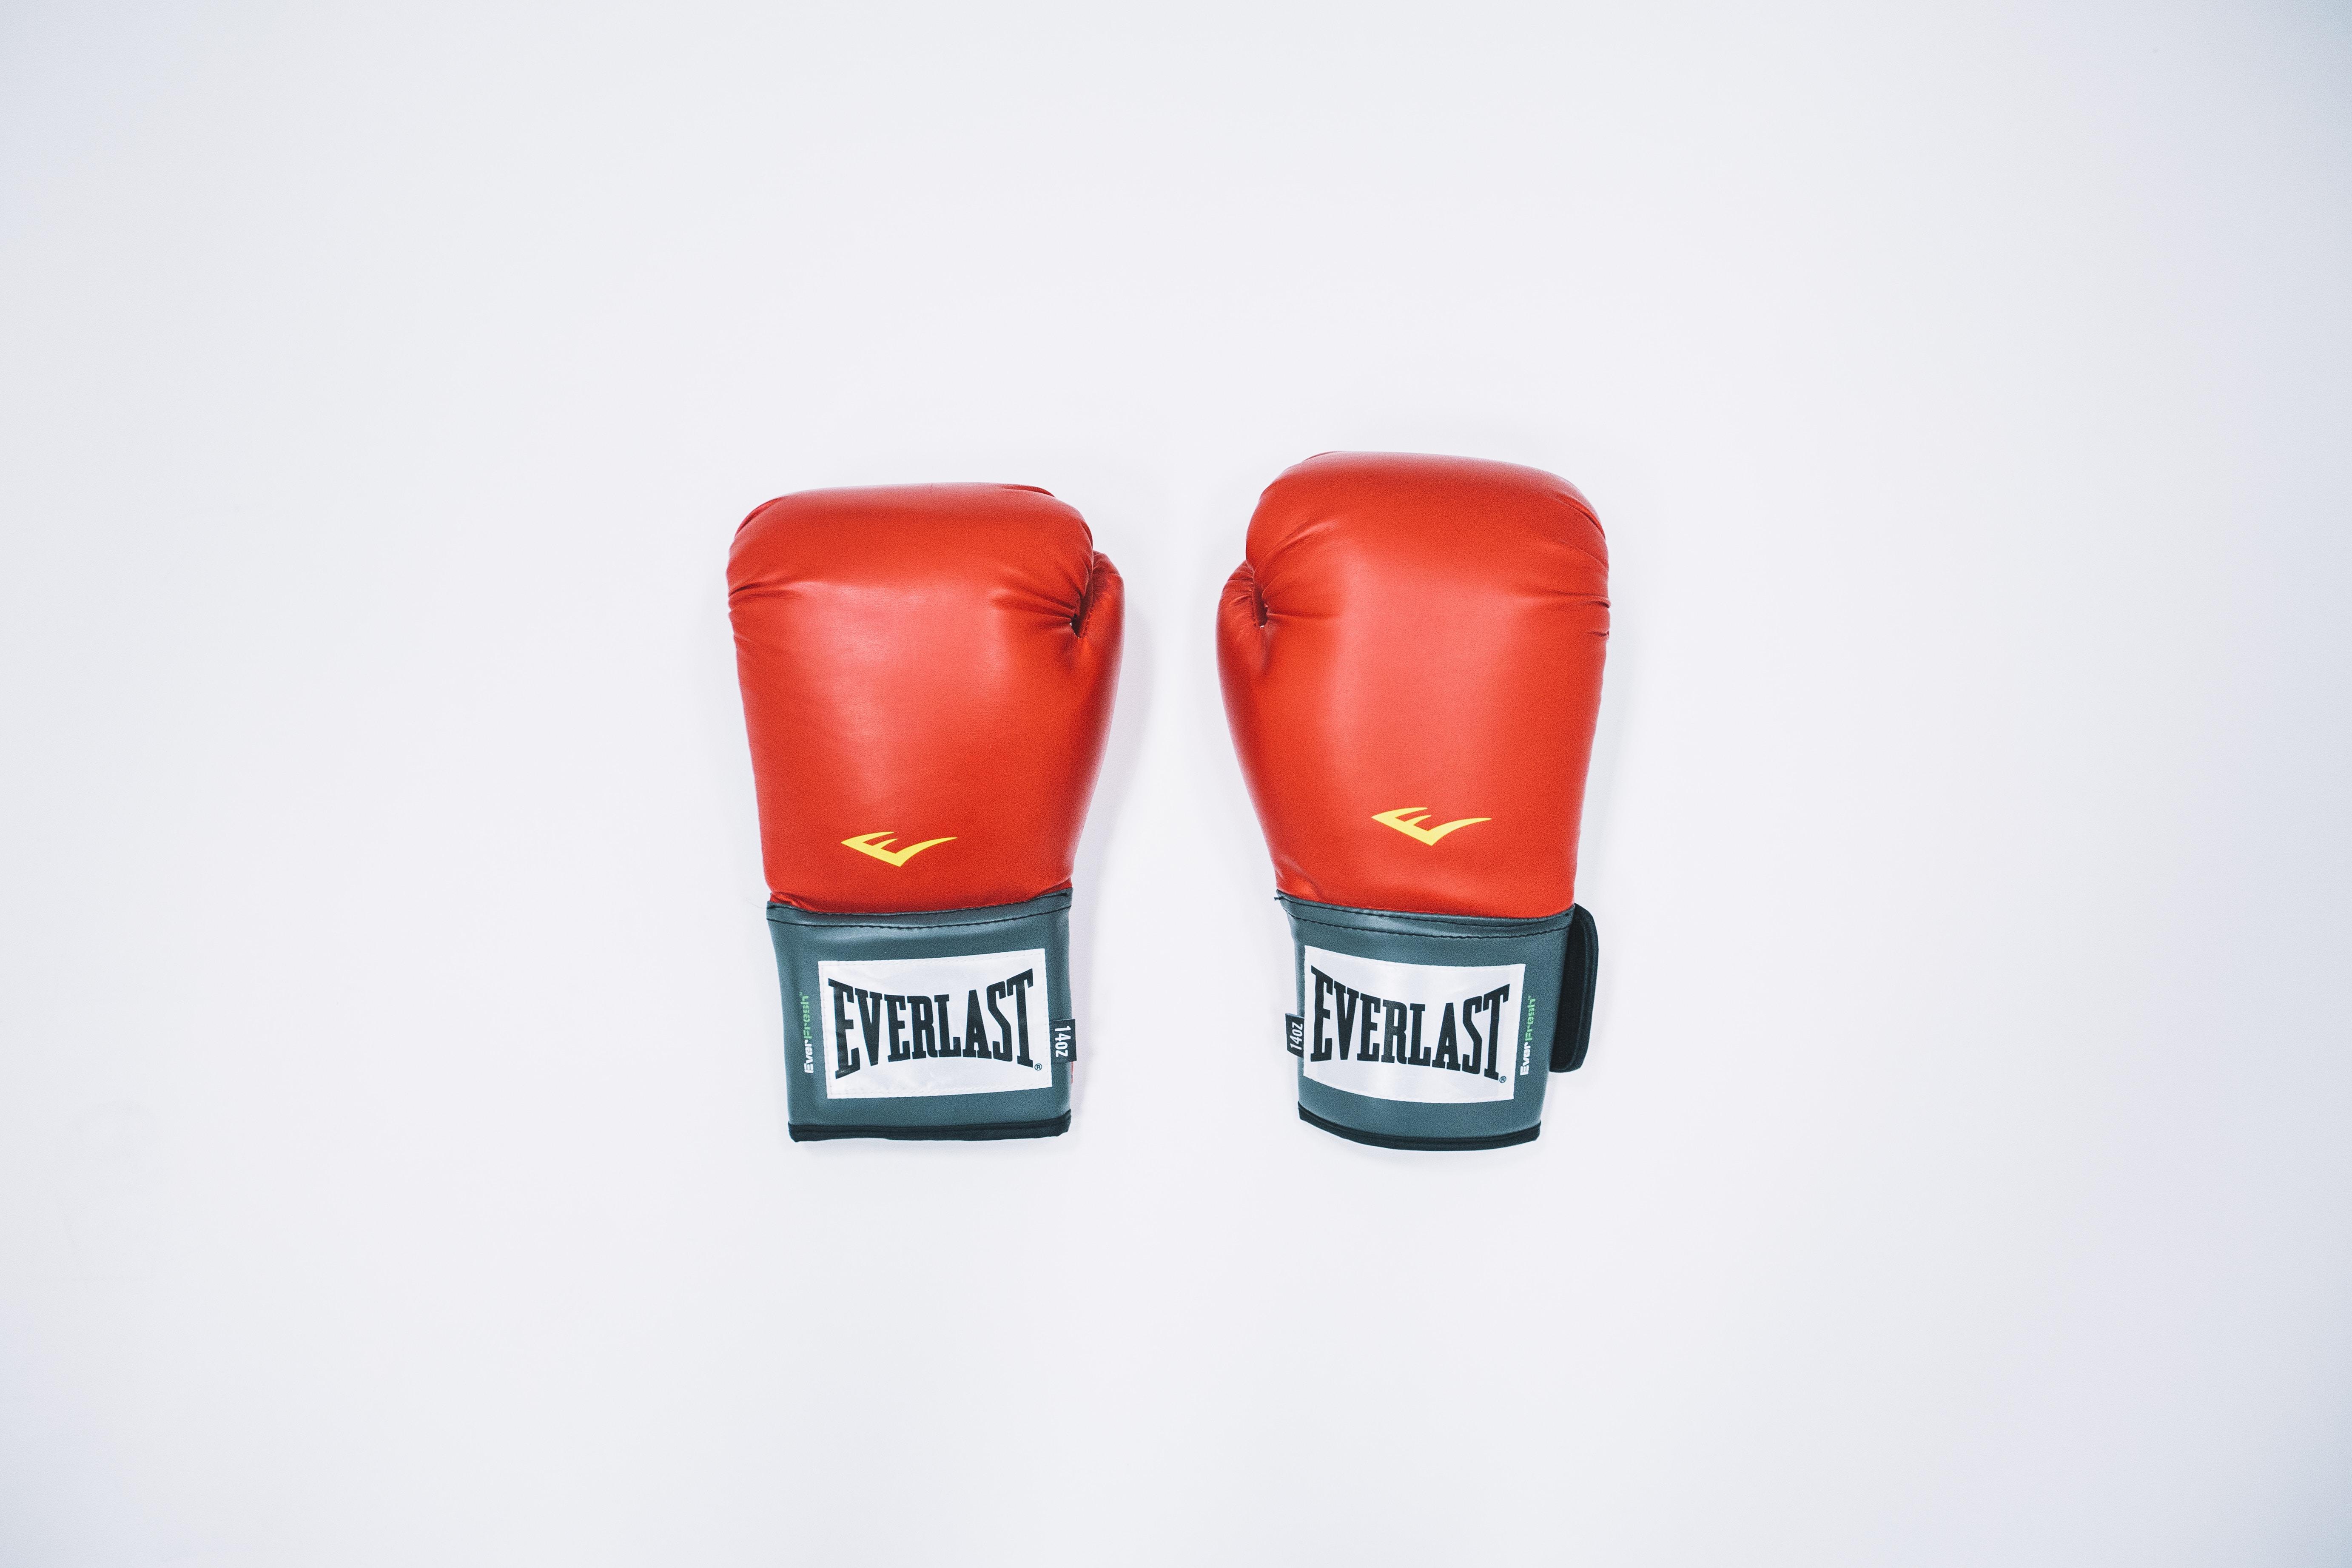 pair of red Everlast training gloves against white background